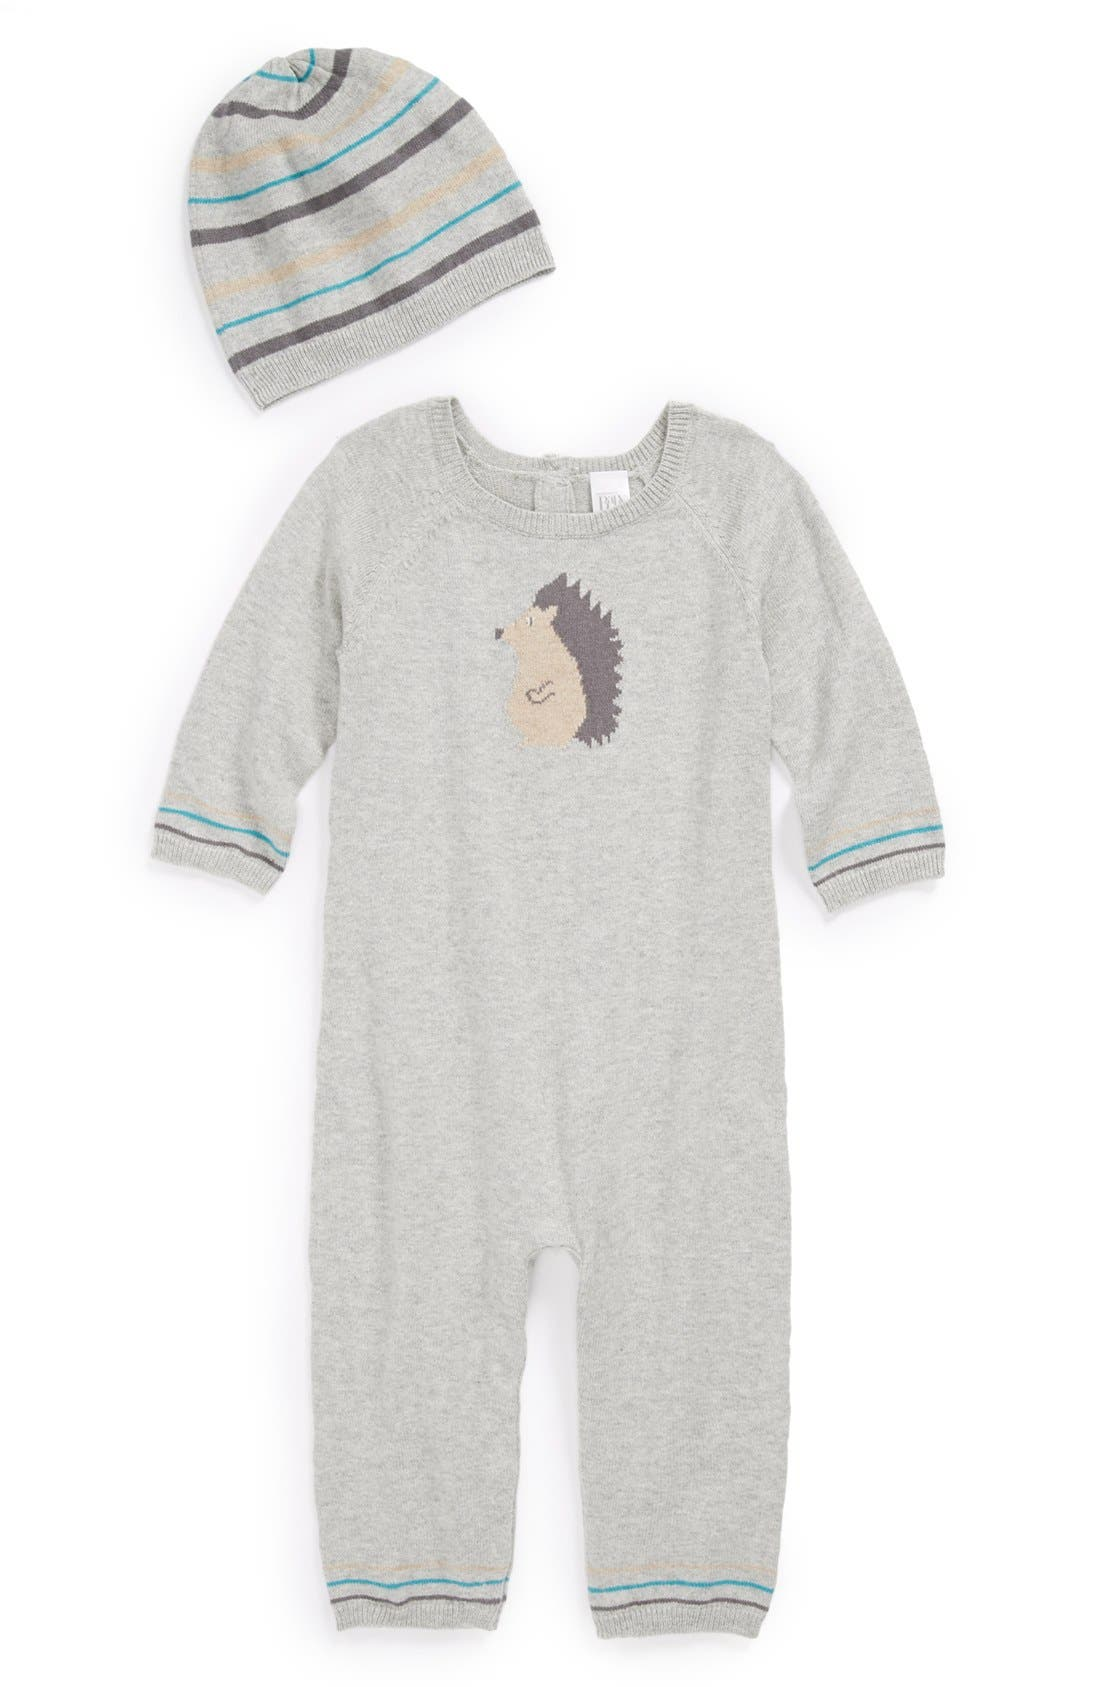 Alternate Image 1 Selected - Nordstrom Baby Romper & Hat (Baby Boys)